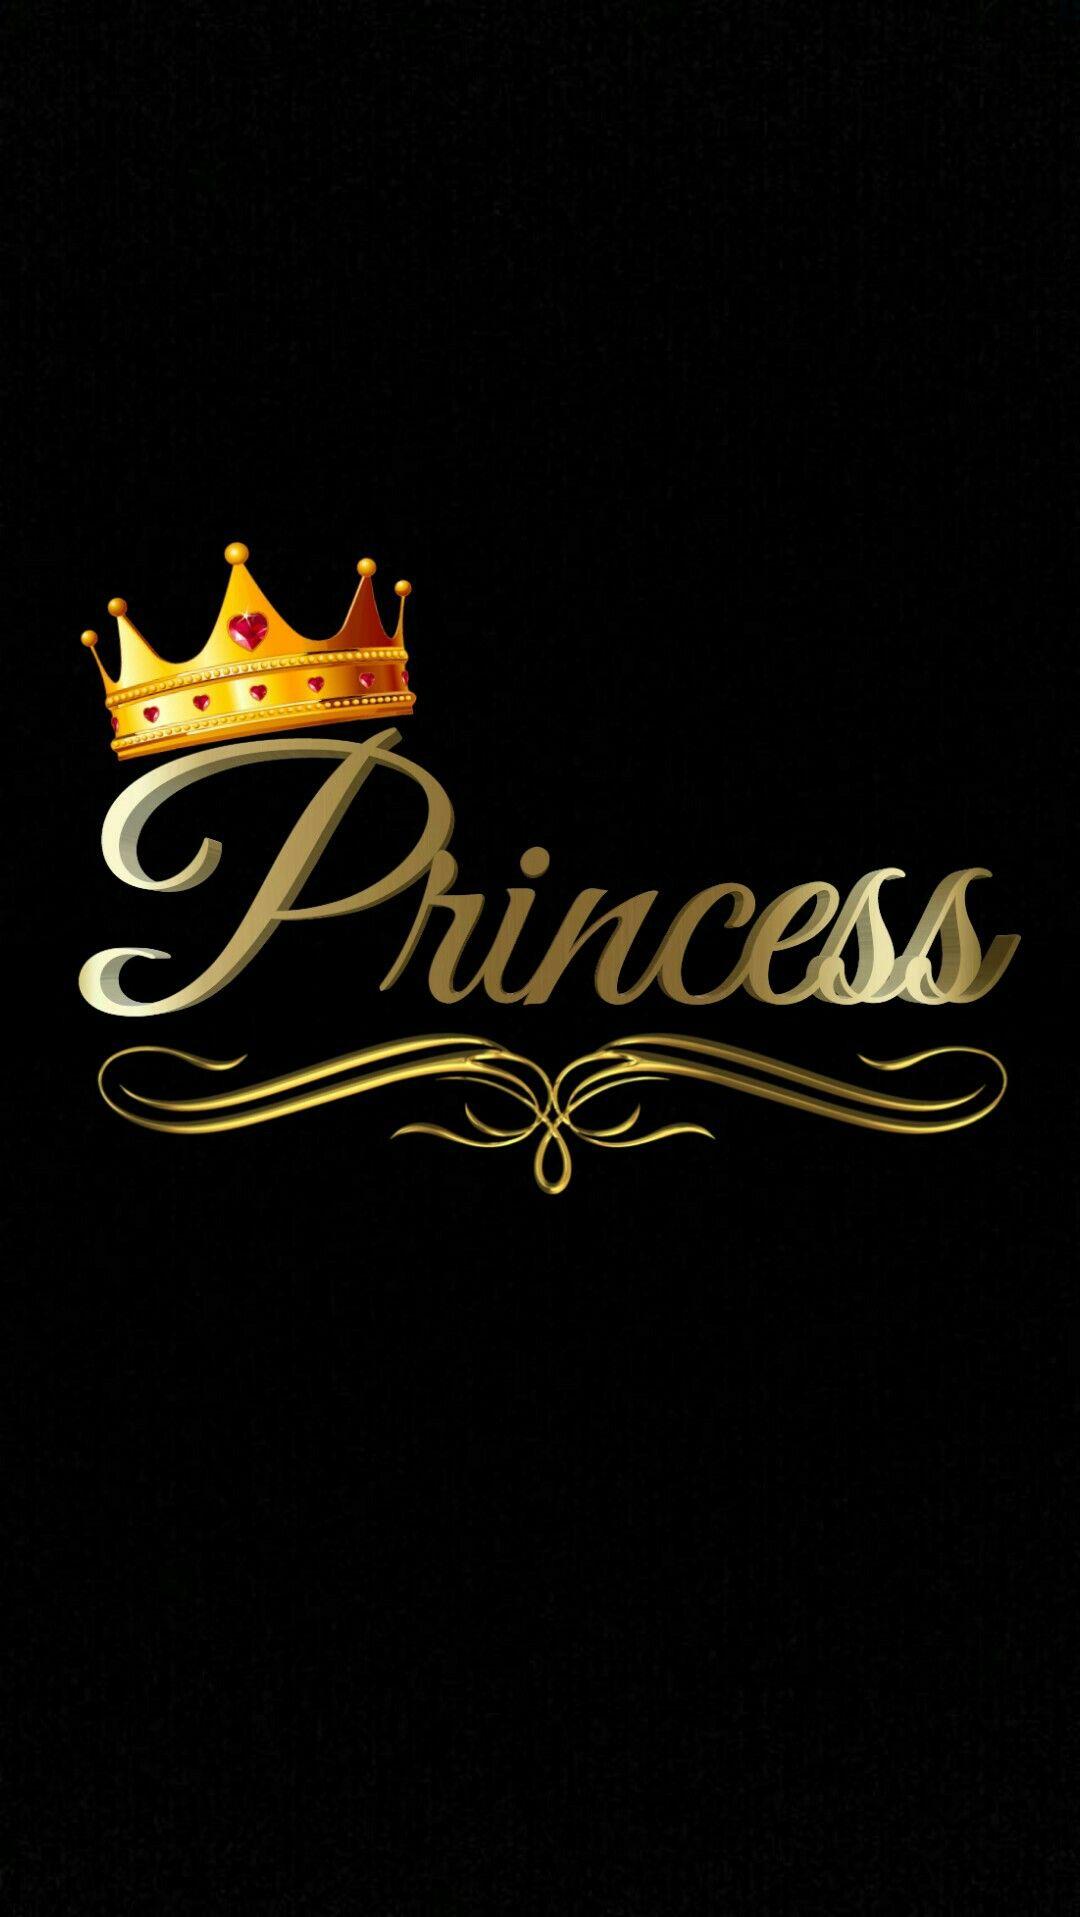 Wallpaper Princess Queen Wallpaper Crown Queens Wallpaper Princess Wallpaper